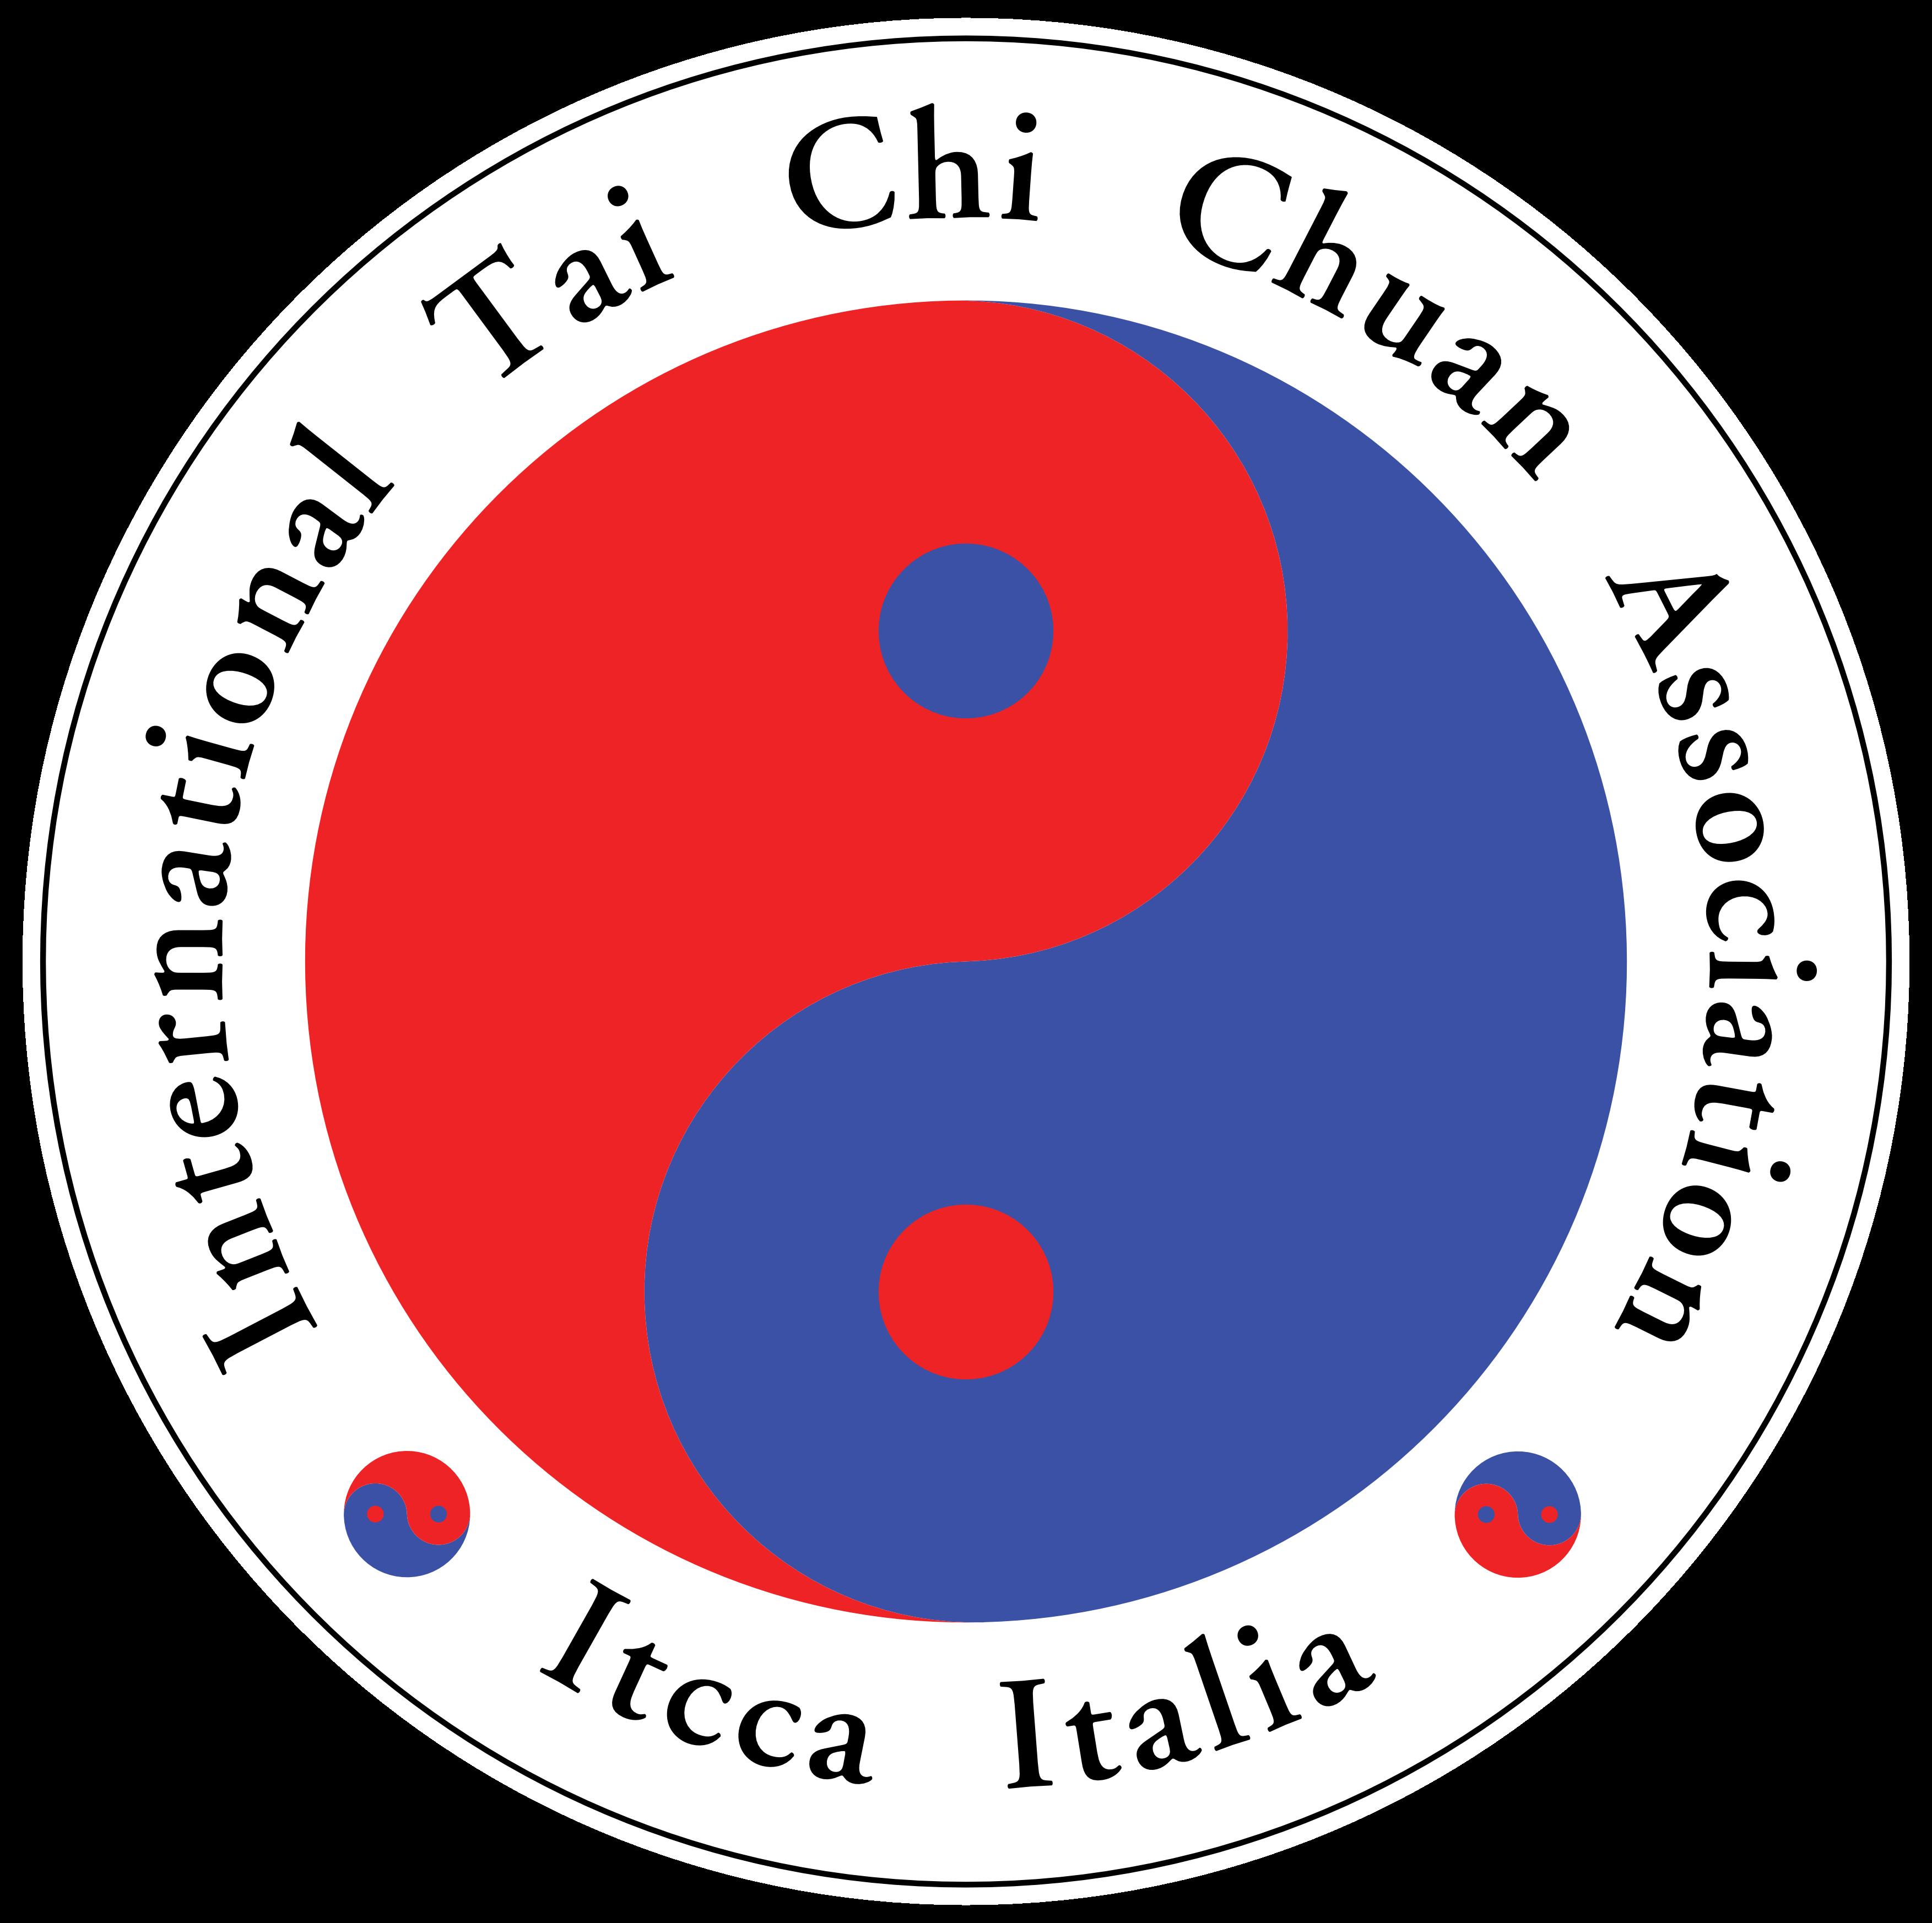 Itcca Italia